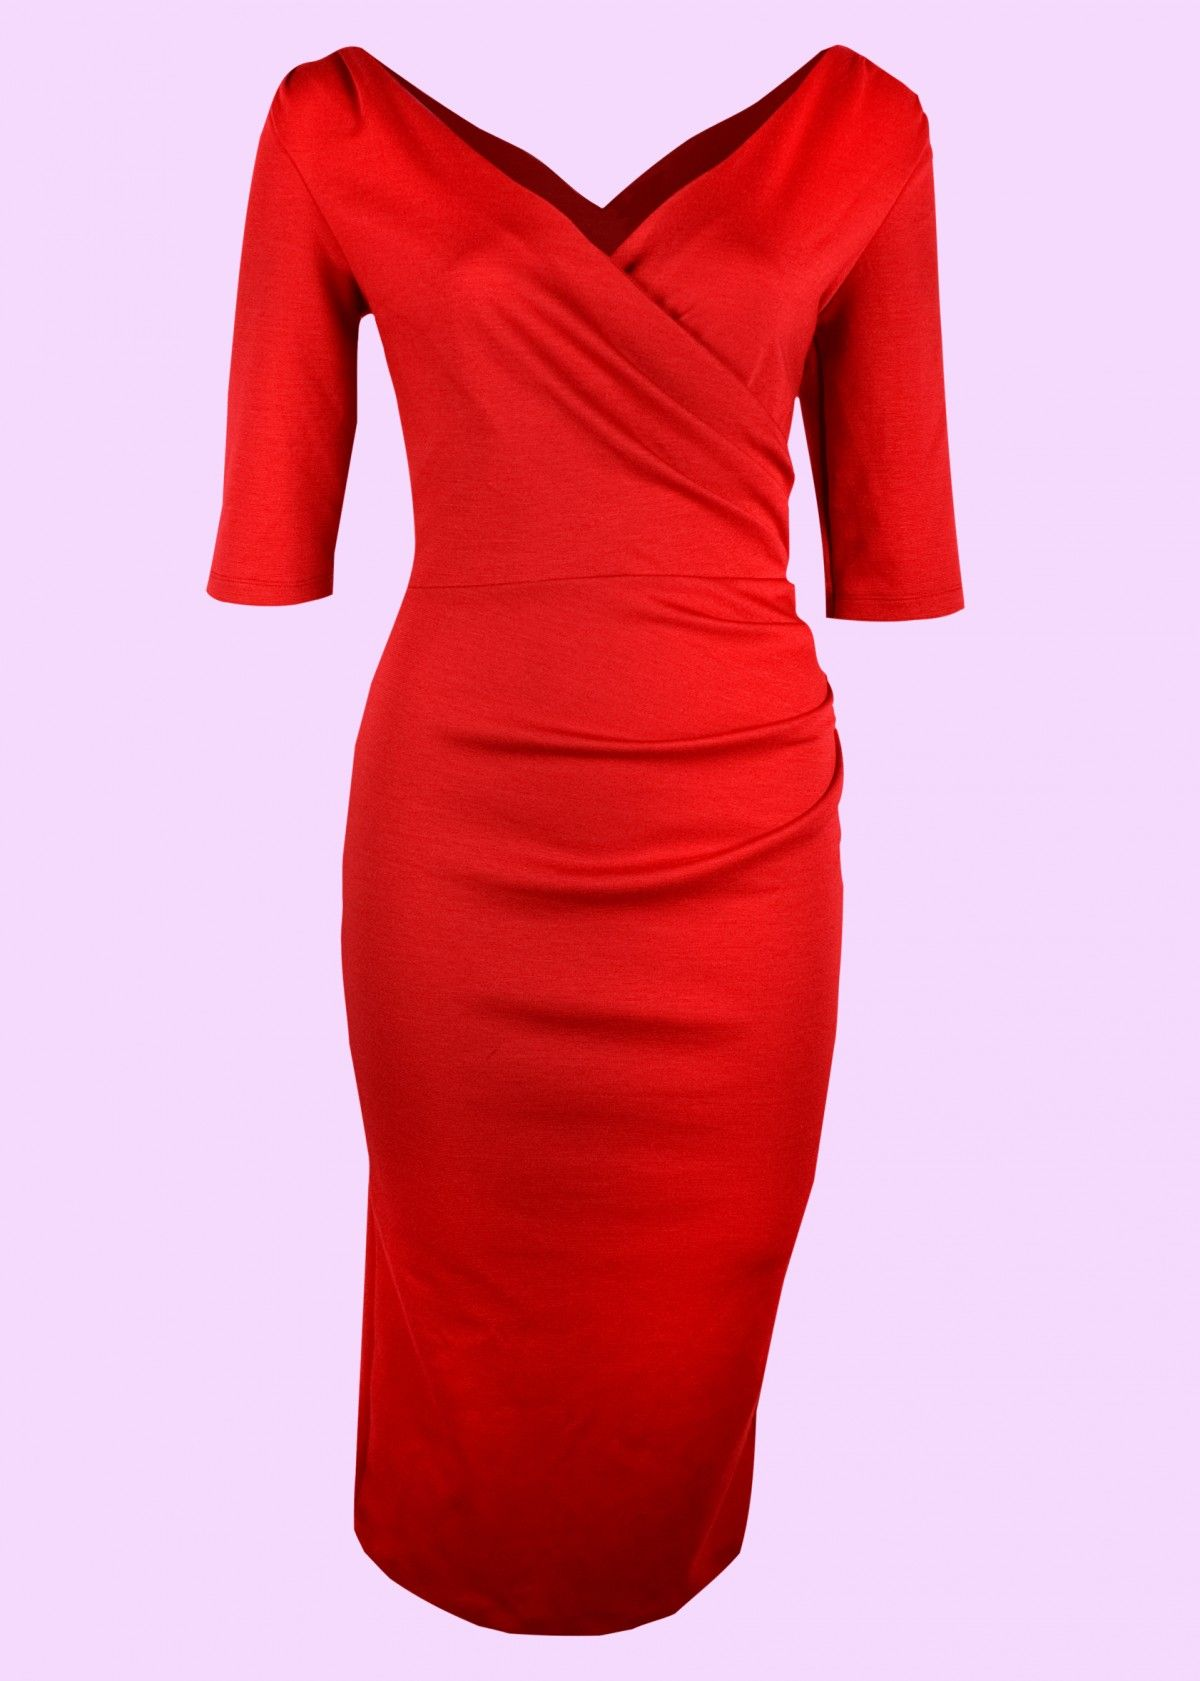 House of foxy: Mansfield dress